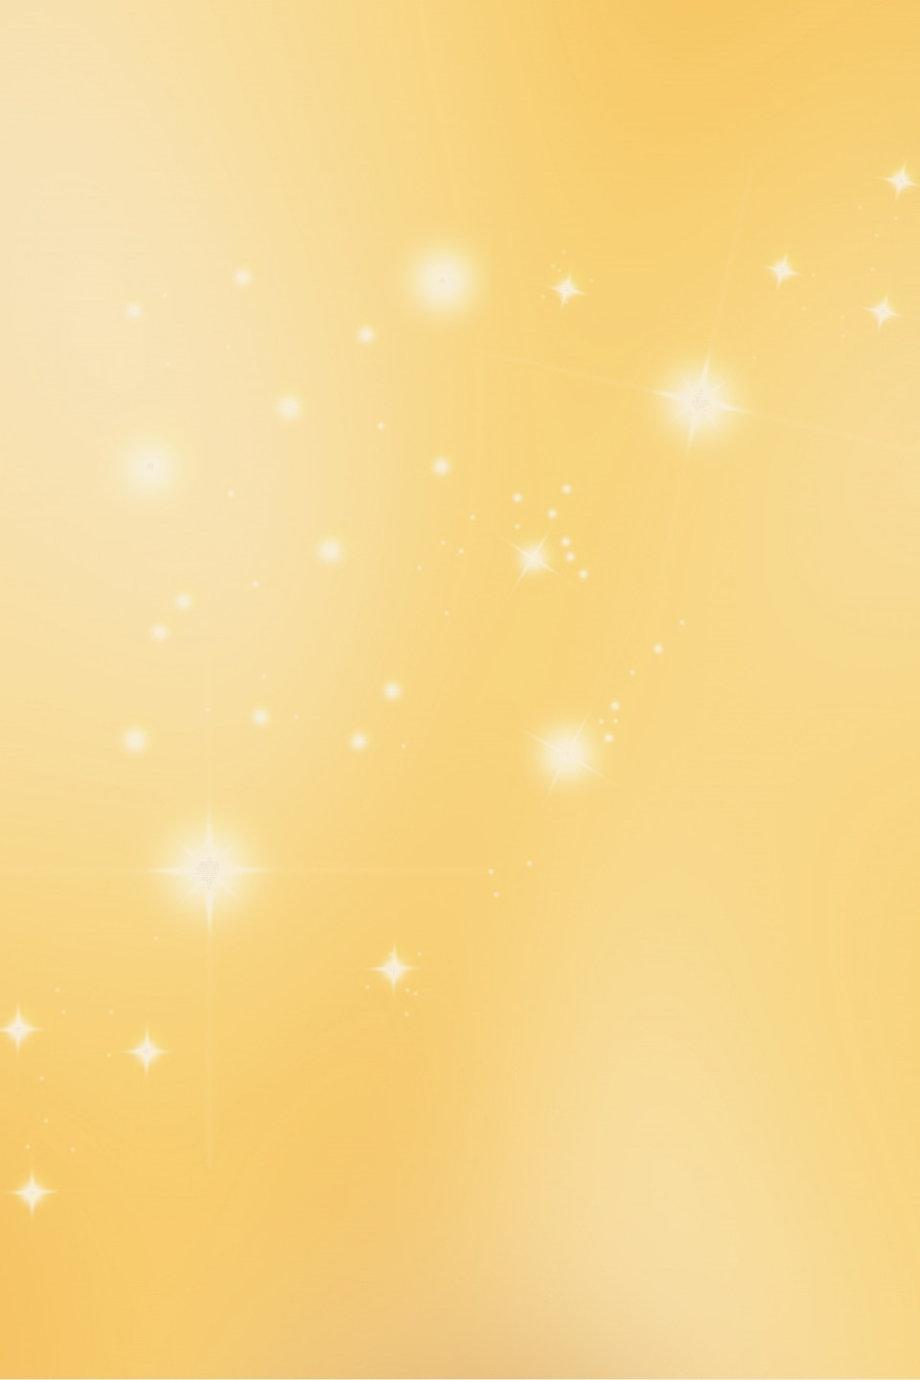 pngtree-golden-gradient-dreamy-backgroun